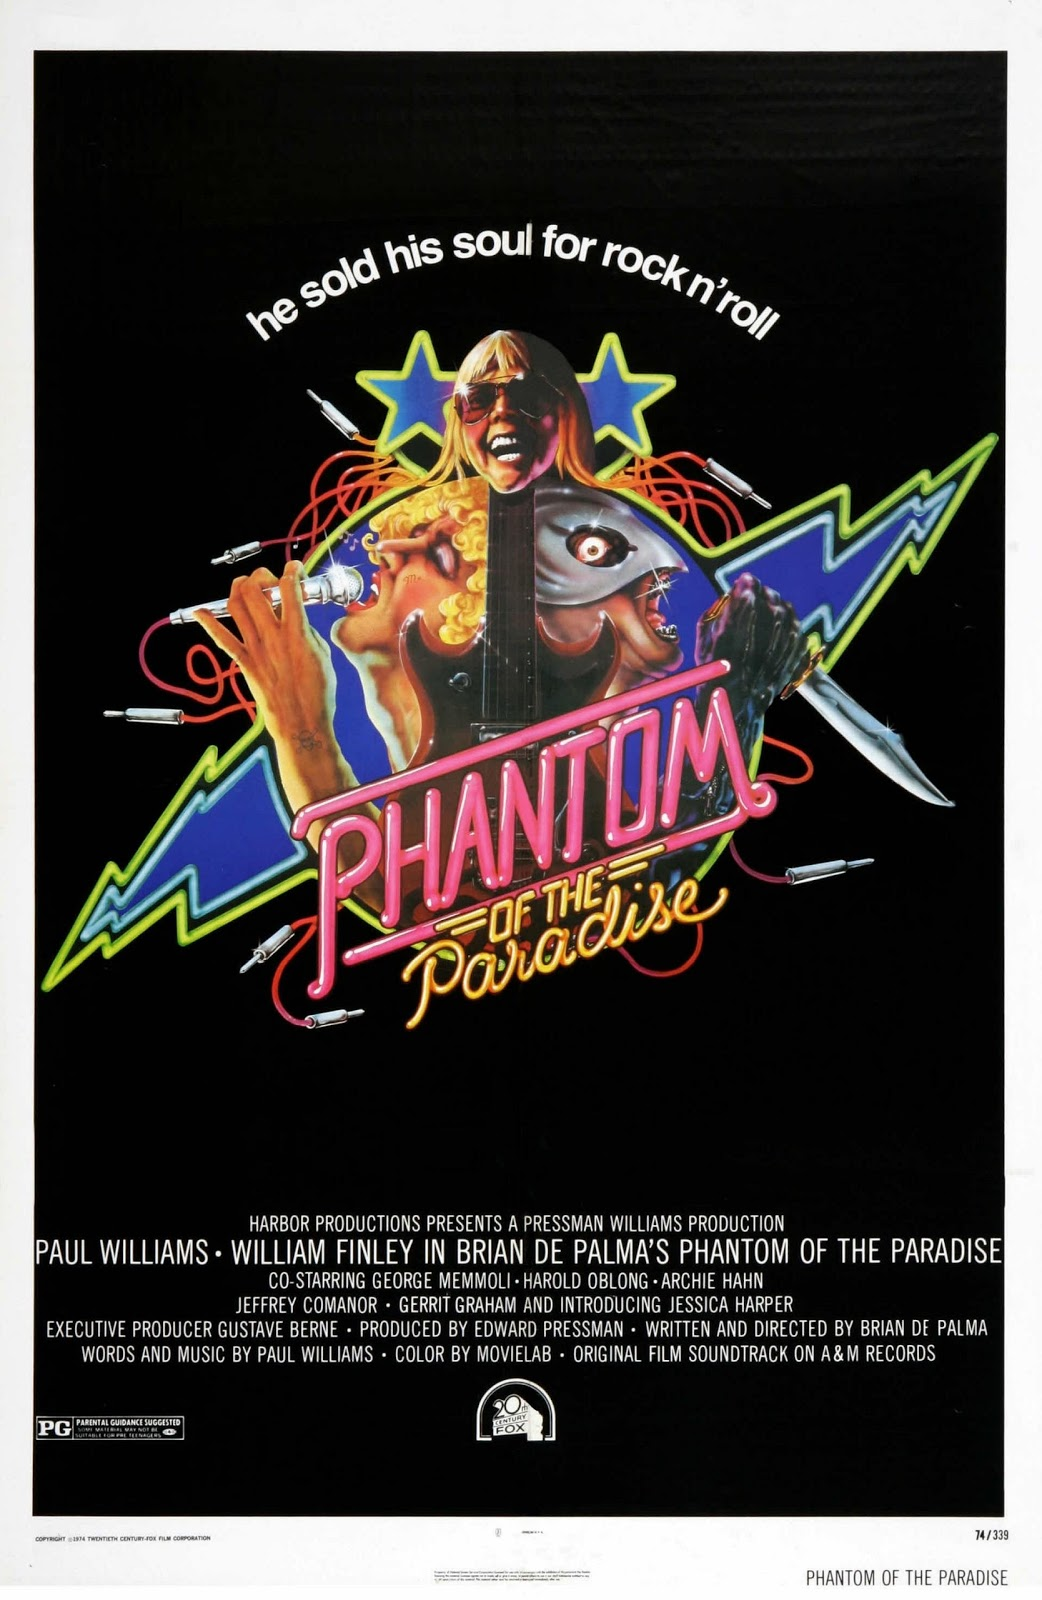 http://3.bp.blogspot.com/-9N9KEmCzkdw/TdWtnEuU9oI/AAAAAAAAKmY/ElDlVpY0WZI/s1600/phantom-of-the-paradise-original.jpg